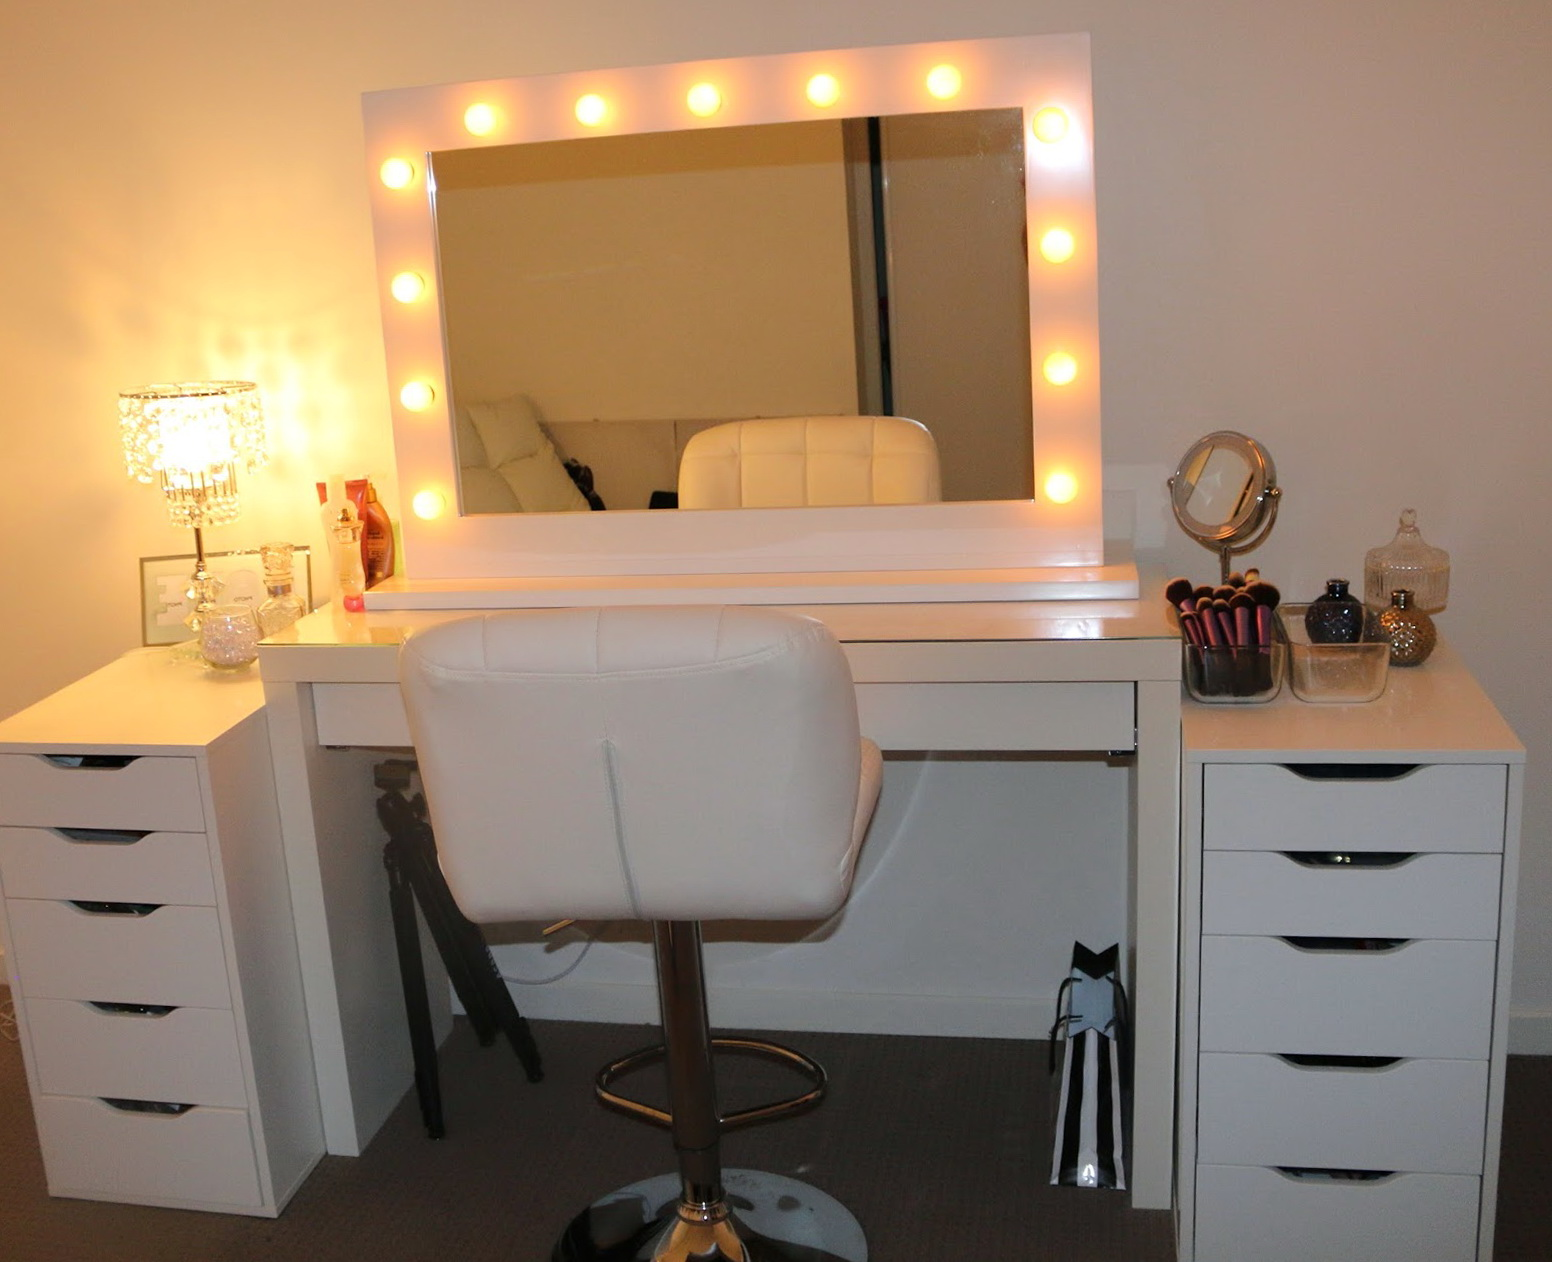 Ikea Vanity Set Upikea Vanity Set Up